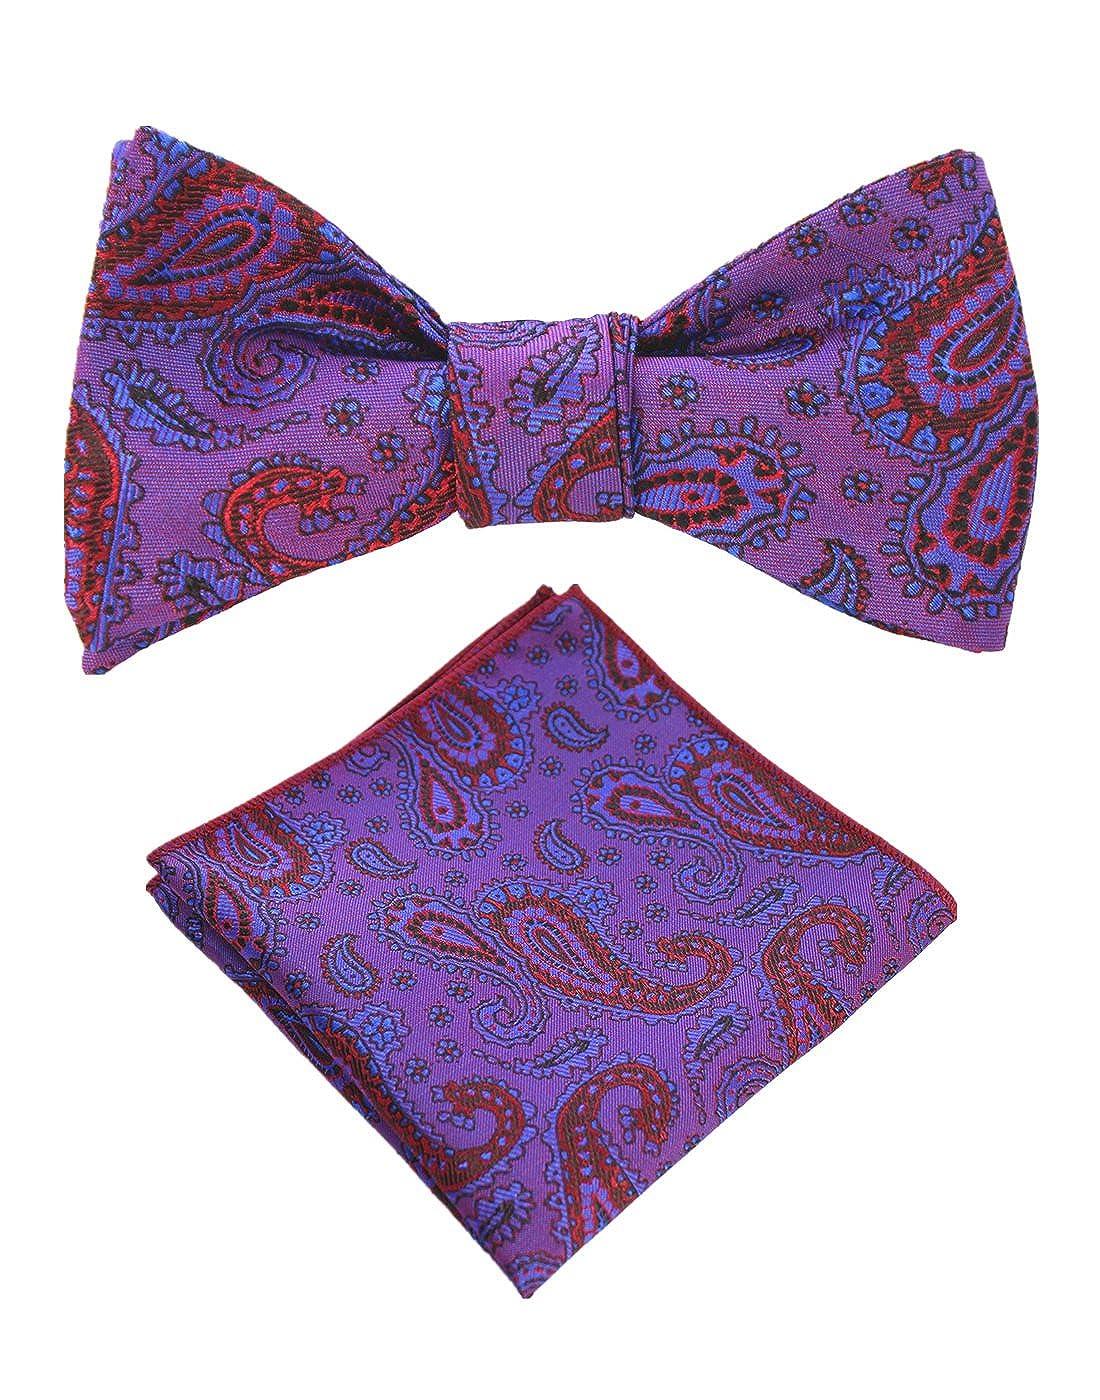 JEMYGINS Original Purple Paisley Mens Bowtie Self Bow Tie & Pocket Square Set (01#4) AG11